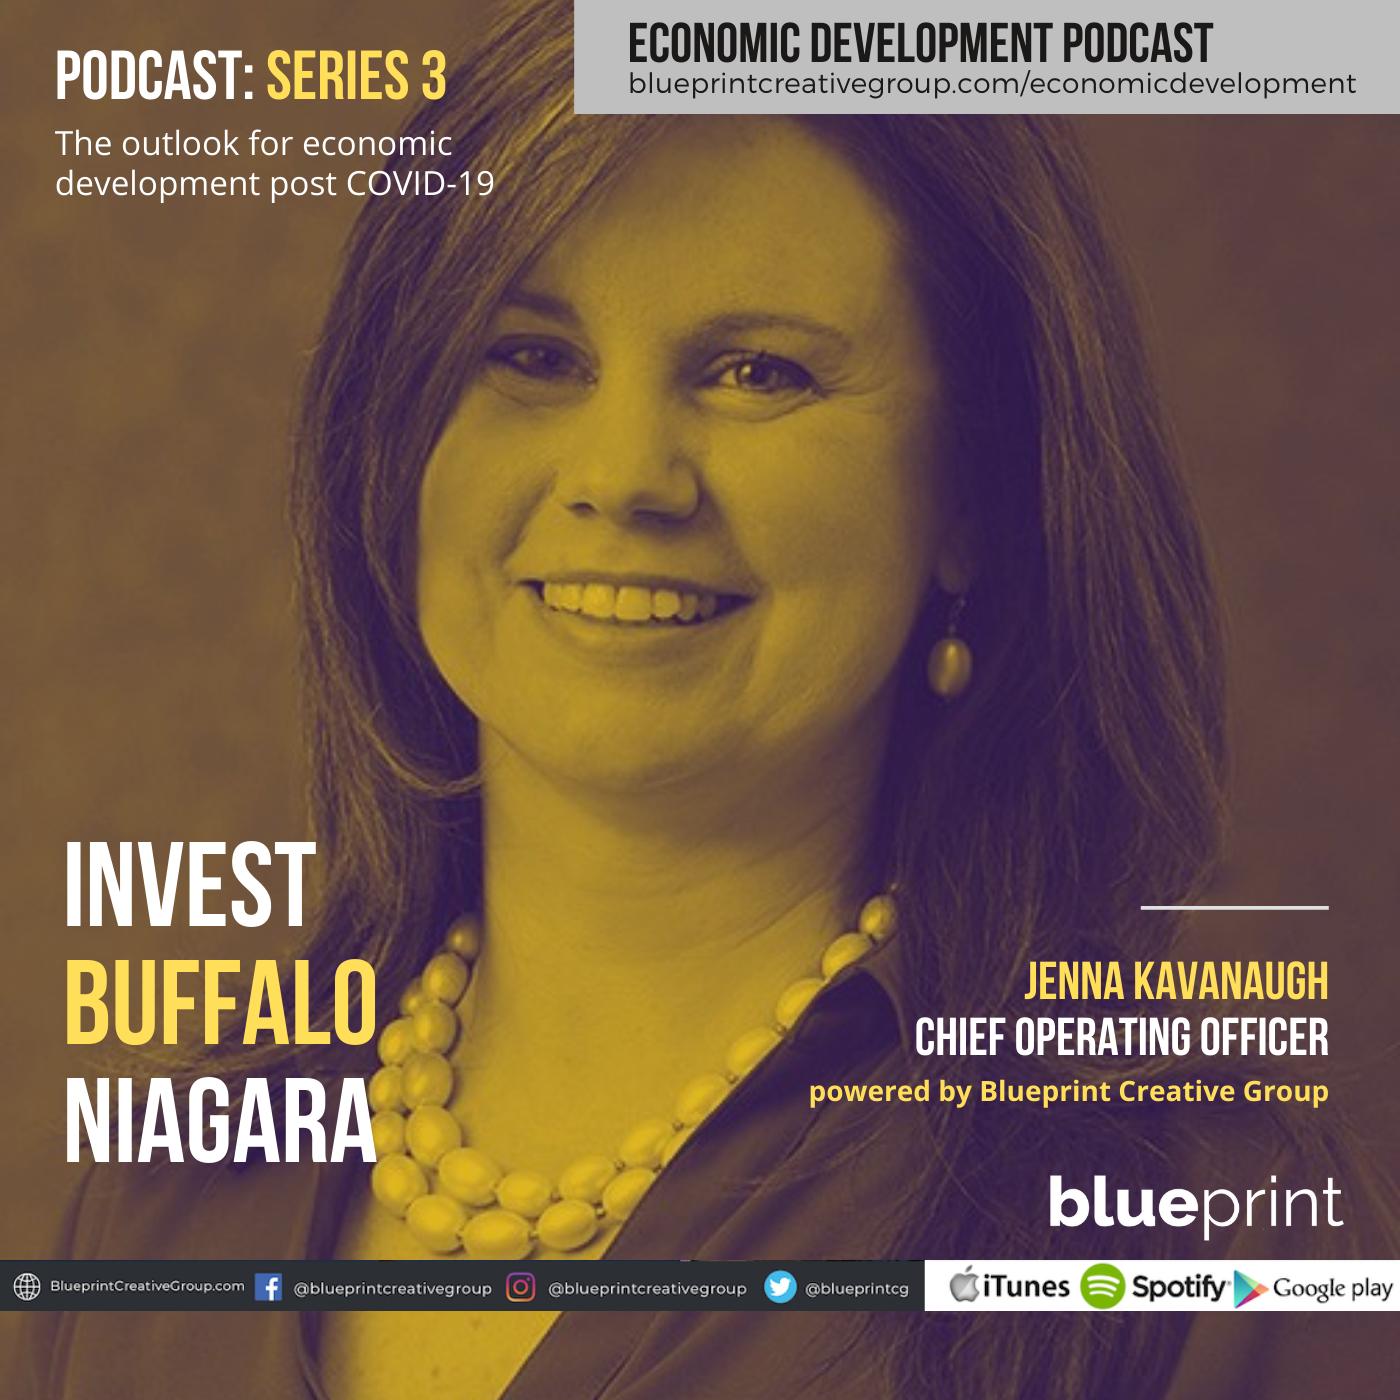 Jenna Kavanaugh - Invest Buffalo Niagara